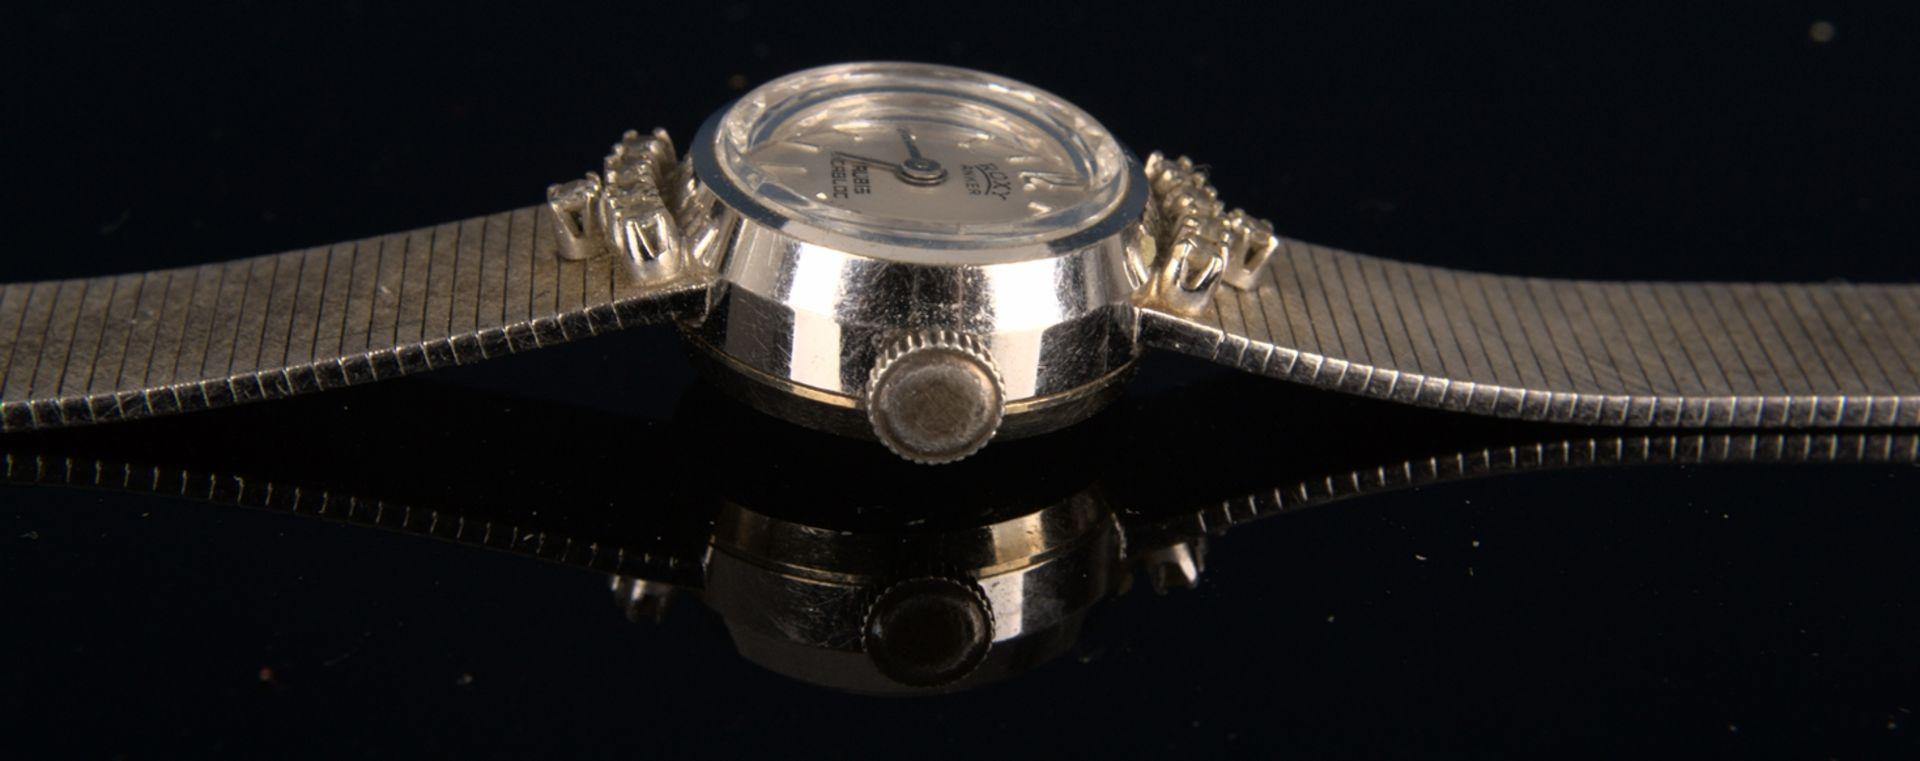 "Elegante COCKTAIL - Damenarmbanduhr der Marke ""ANKER - ROXY"" - 17 Rubis - Incabloc. Handaufzug, - Bild 10 aus 11"